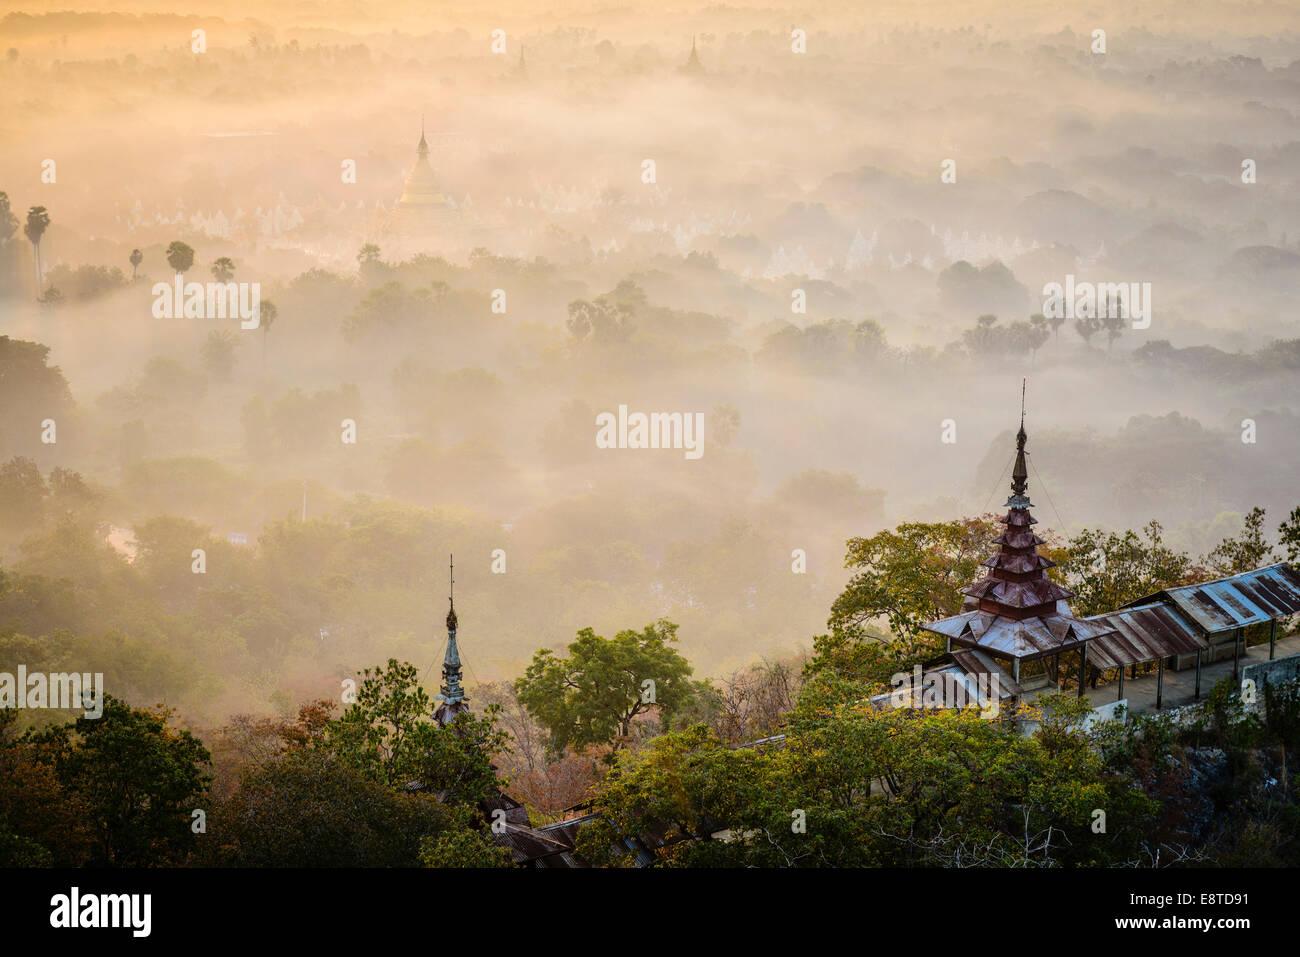 La nebbia sopra le cime degli alberi, Mayanmar, Mandalay Myanmar Immagini Stock